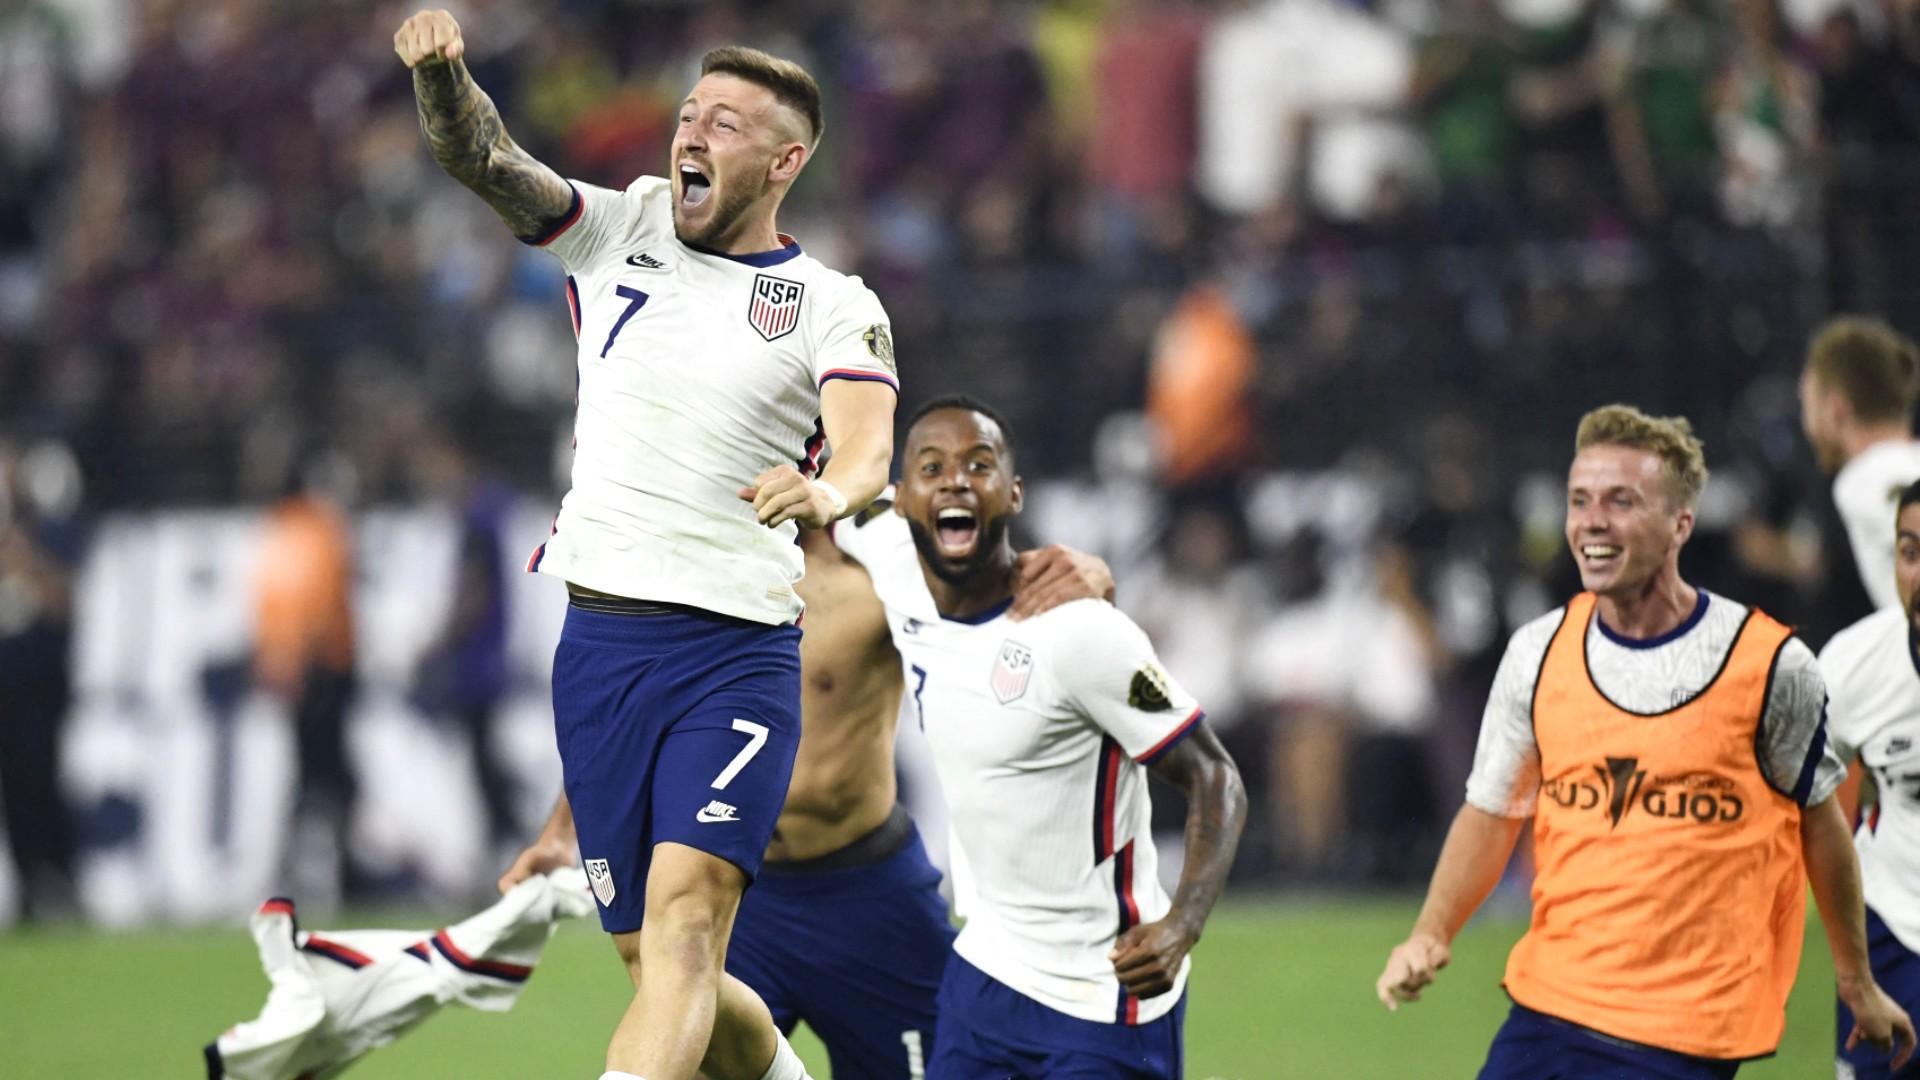 Paul-arriola-celebration-2021-gold-cup_1ll97cq1coi3f1dg63k1q21w0q